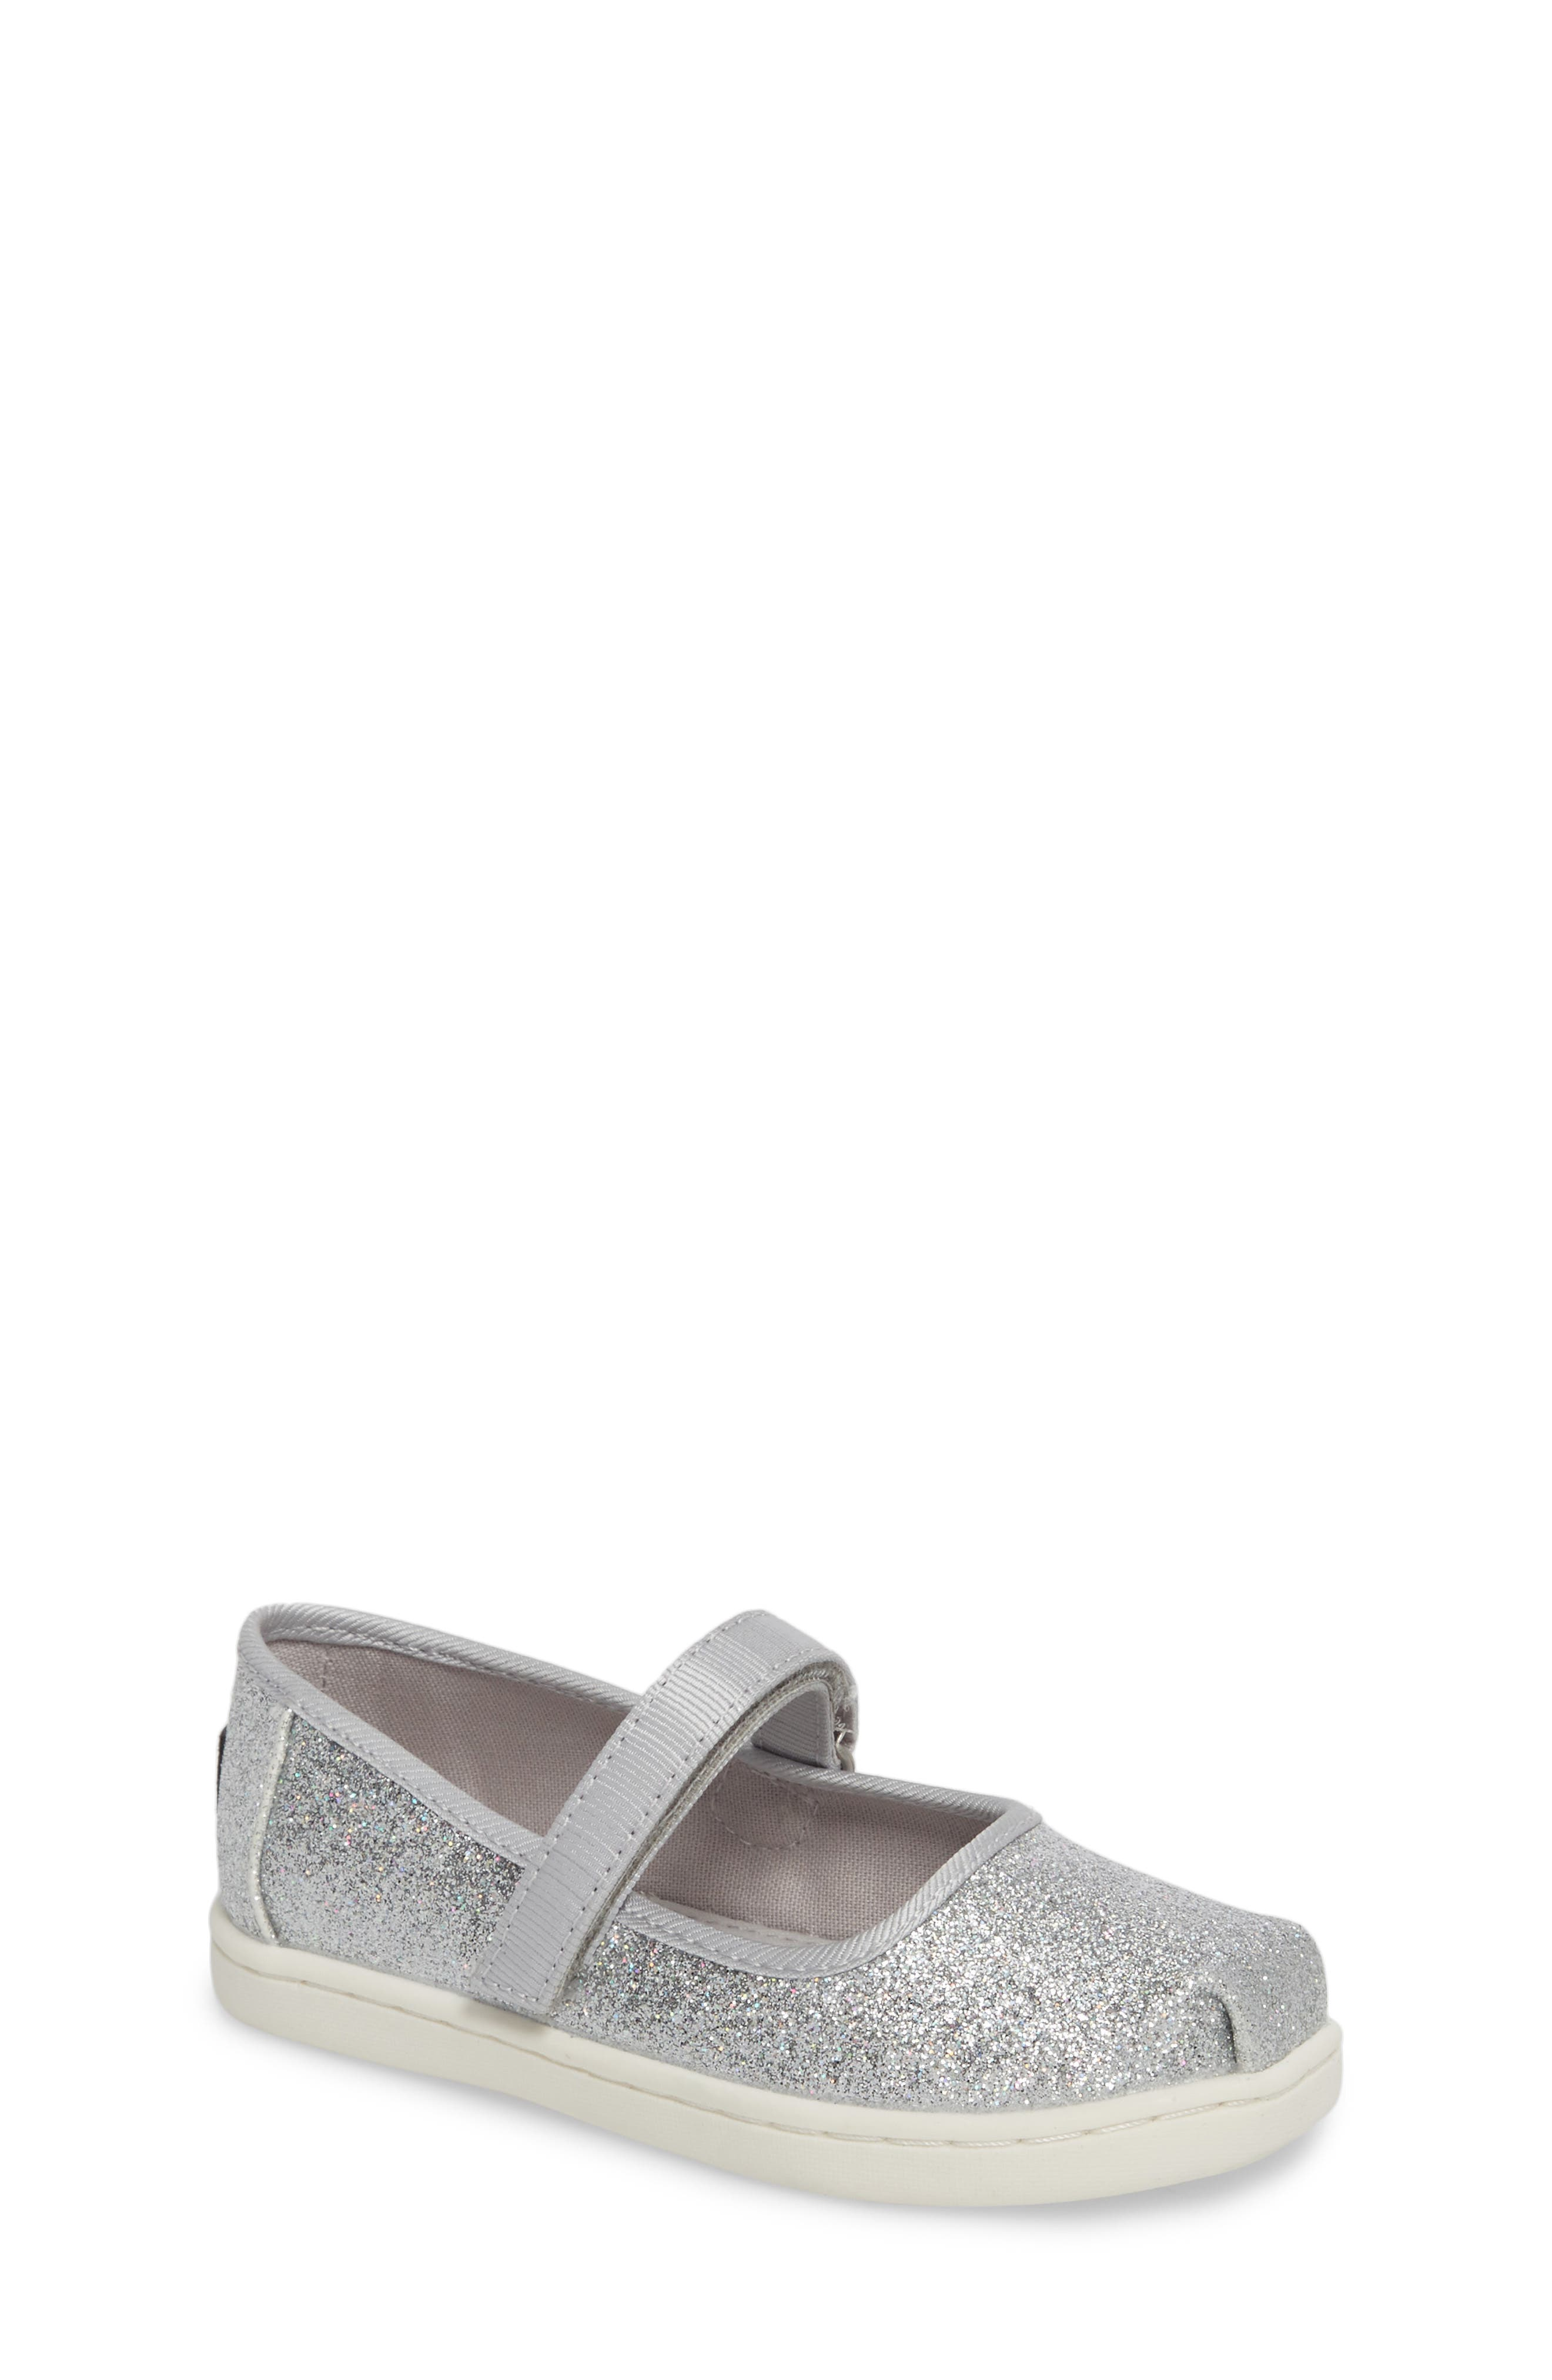 Mary Jane Sneaker,                             Main thumbnail 1, color,                             040